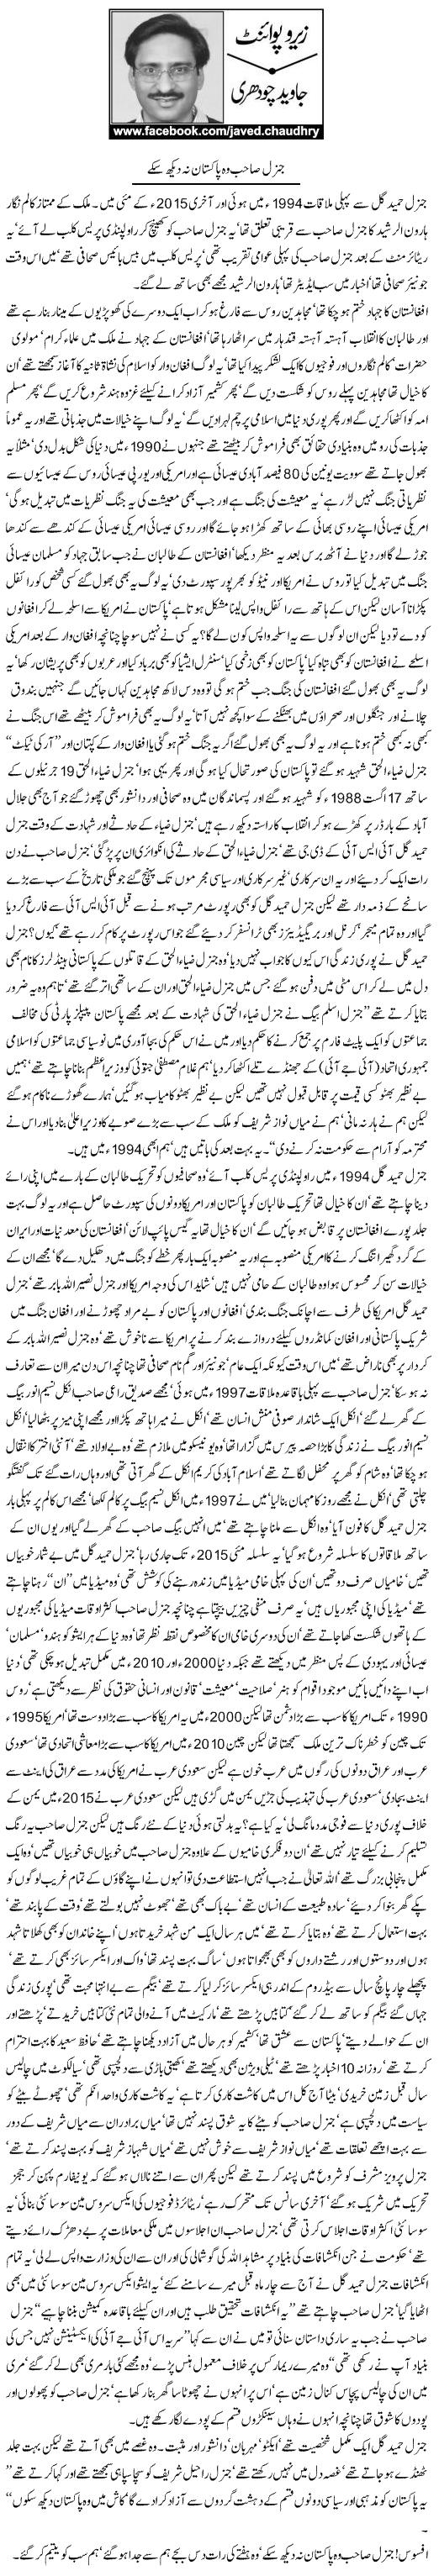 Javed Chaudhry Column | General Sahib Wo Pakistan Na Dekh Sakay | Zero Point